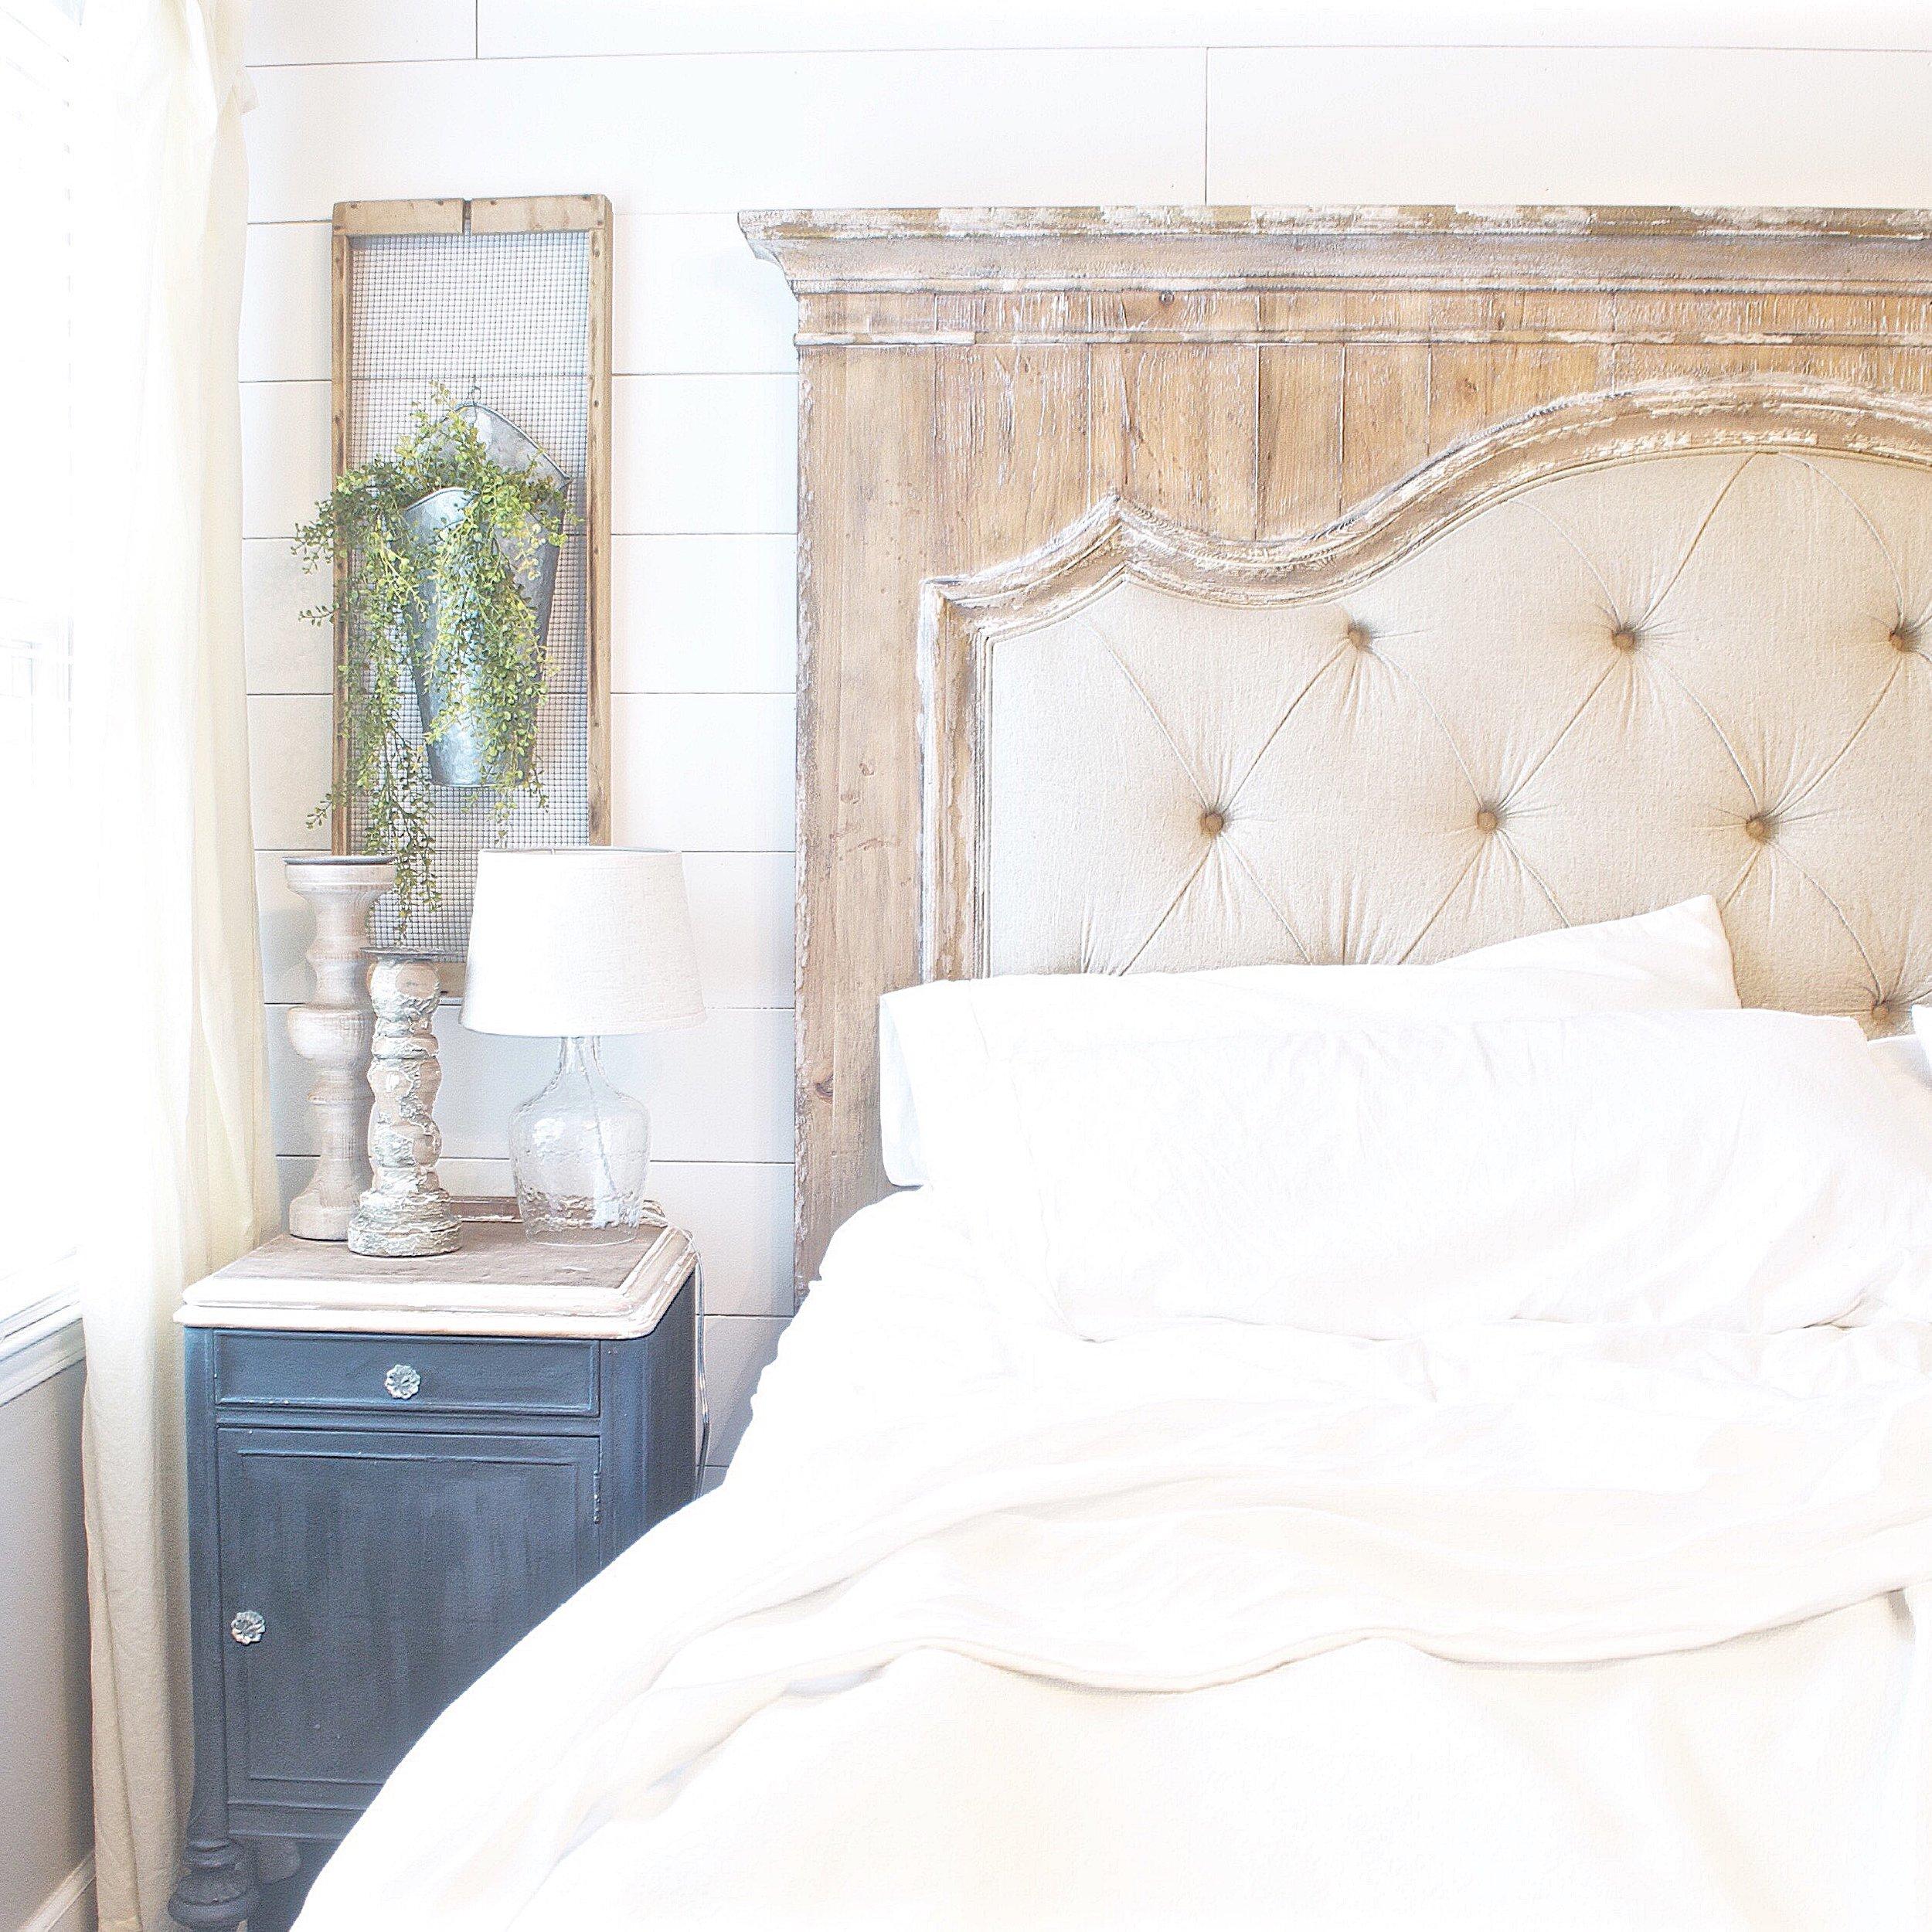 Plum Pretty Decor and Design Farmhouse Master Bedroom Tour- Bedding